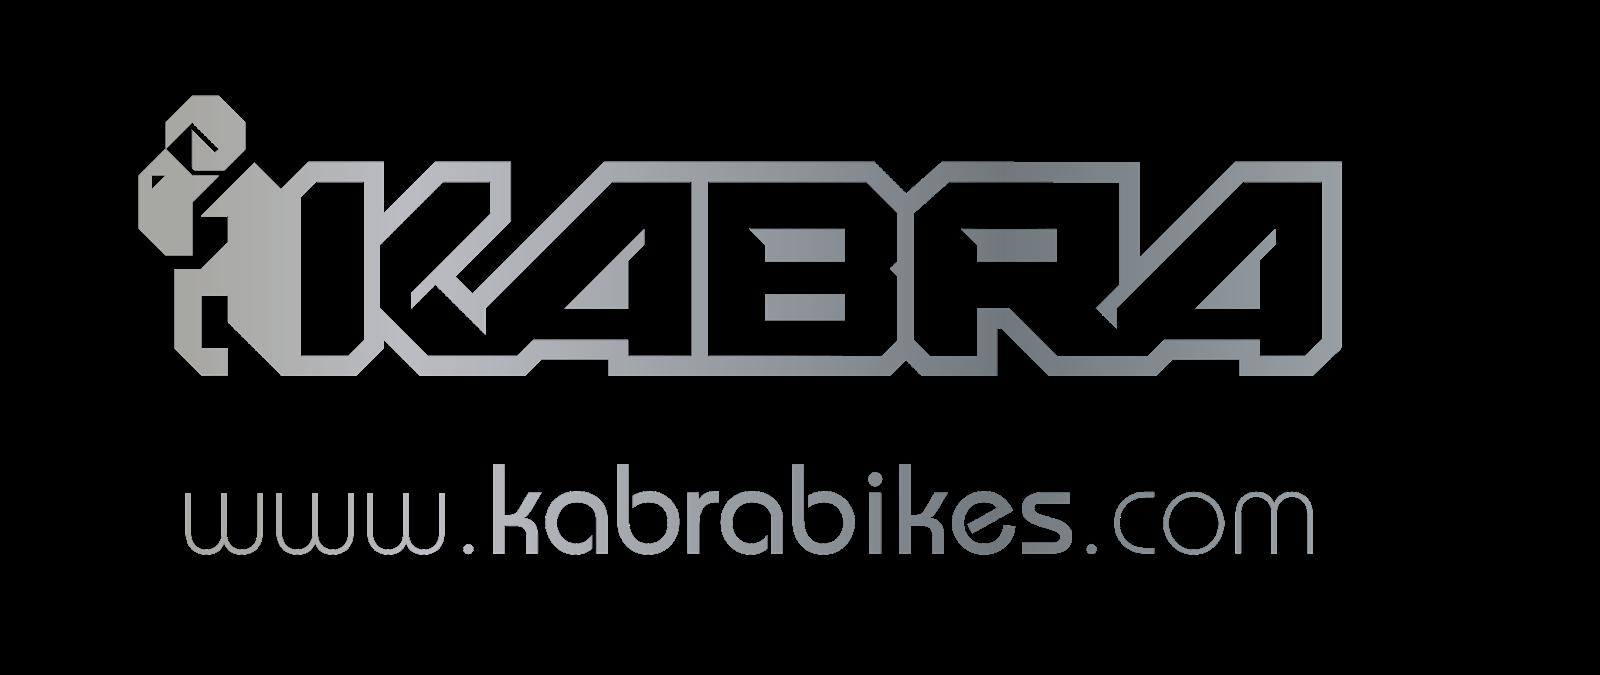 www.kabrabikes.com